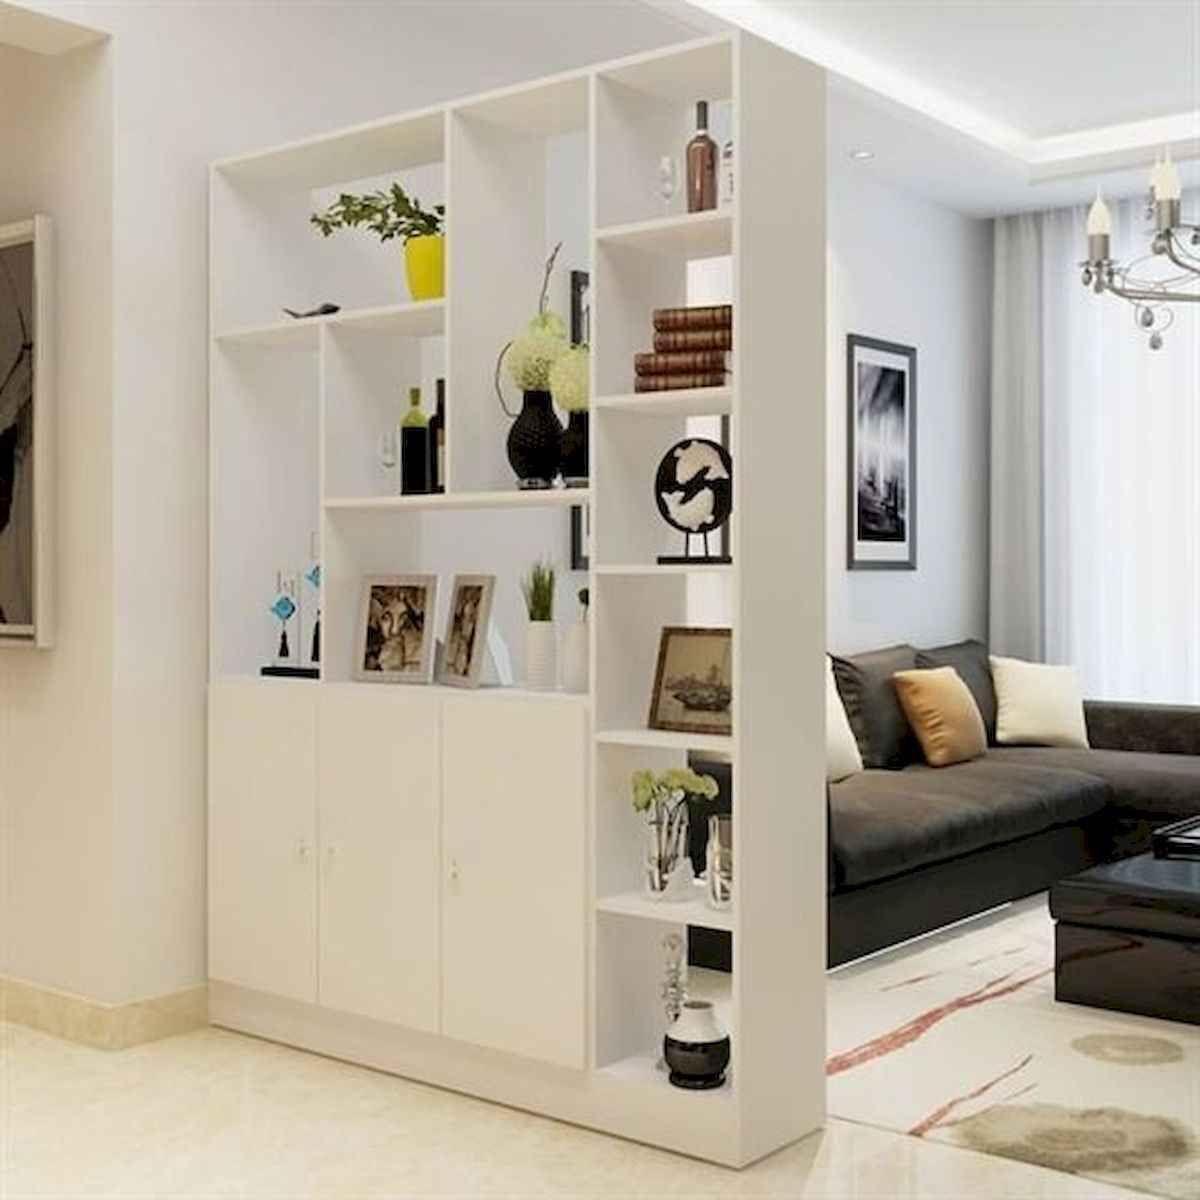 60 Favorite Studio Apartment Storage Decor Ideas And Remodel 7